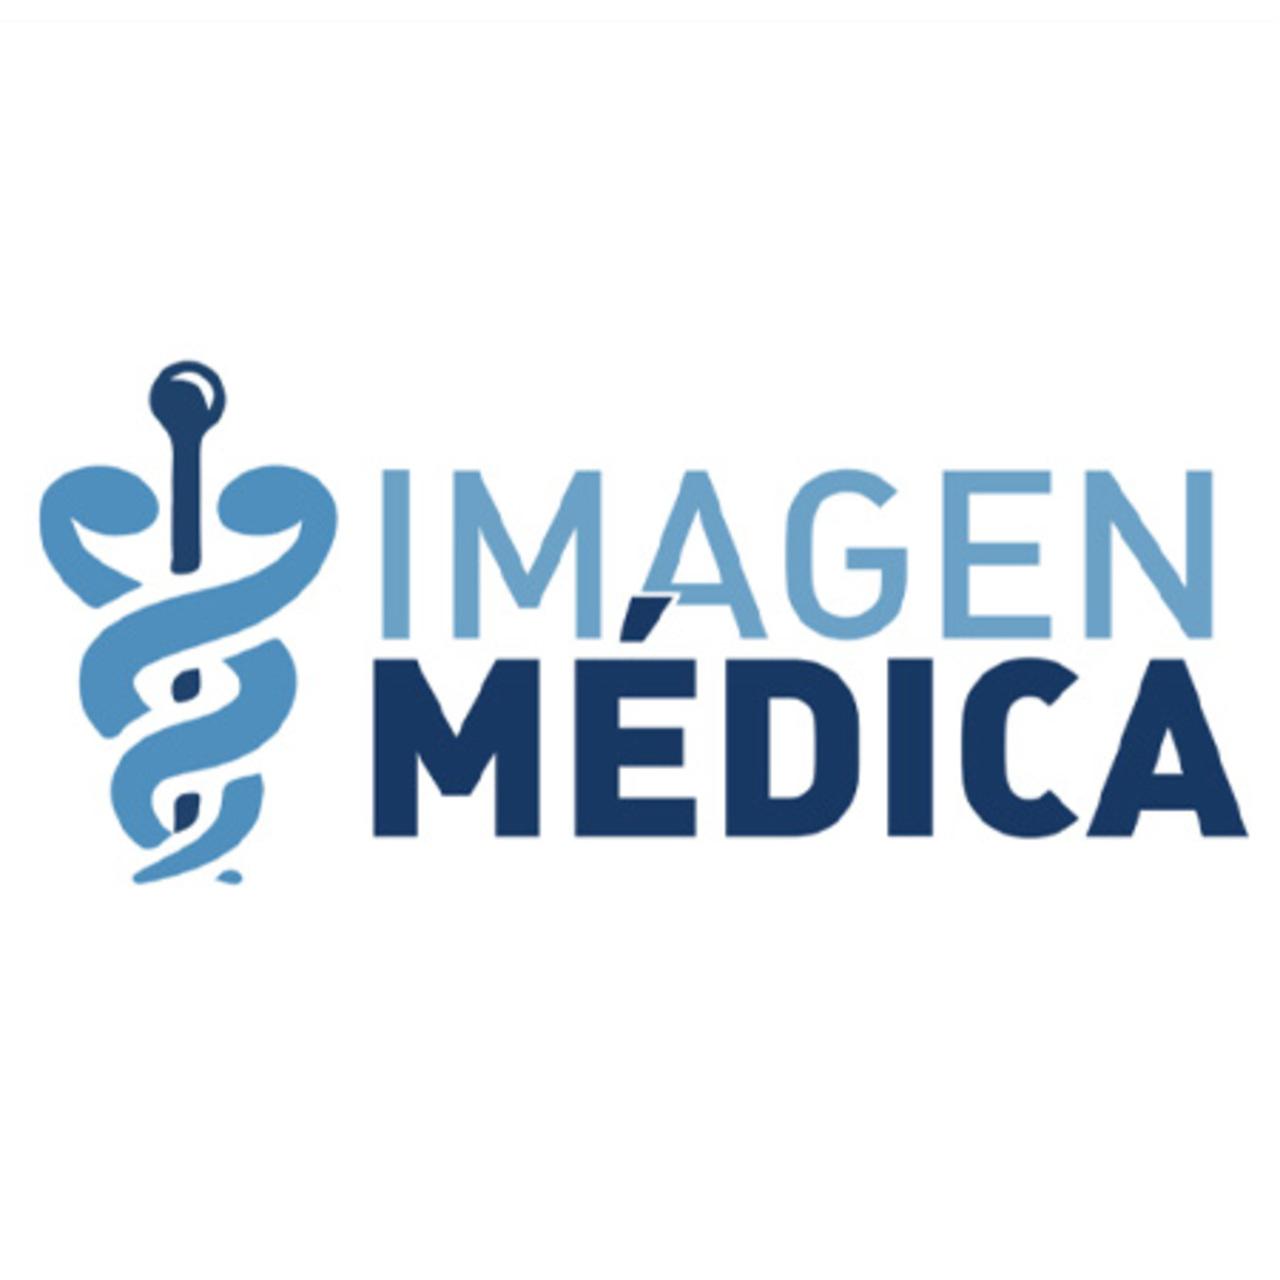 Imagen Médica